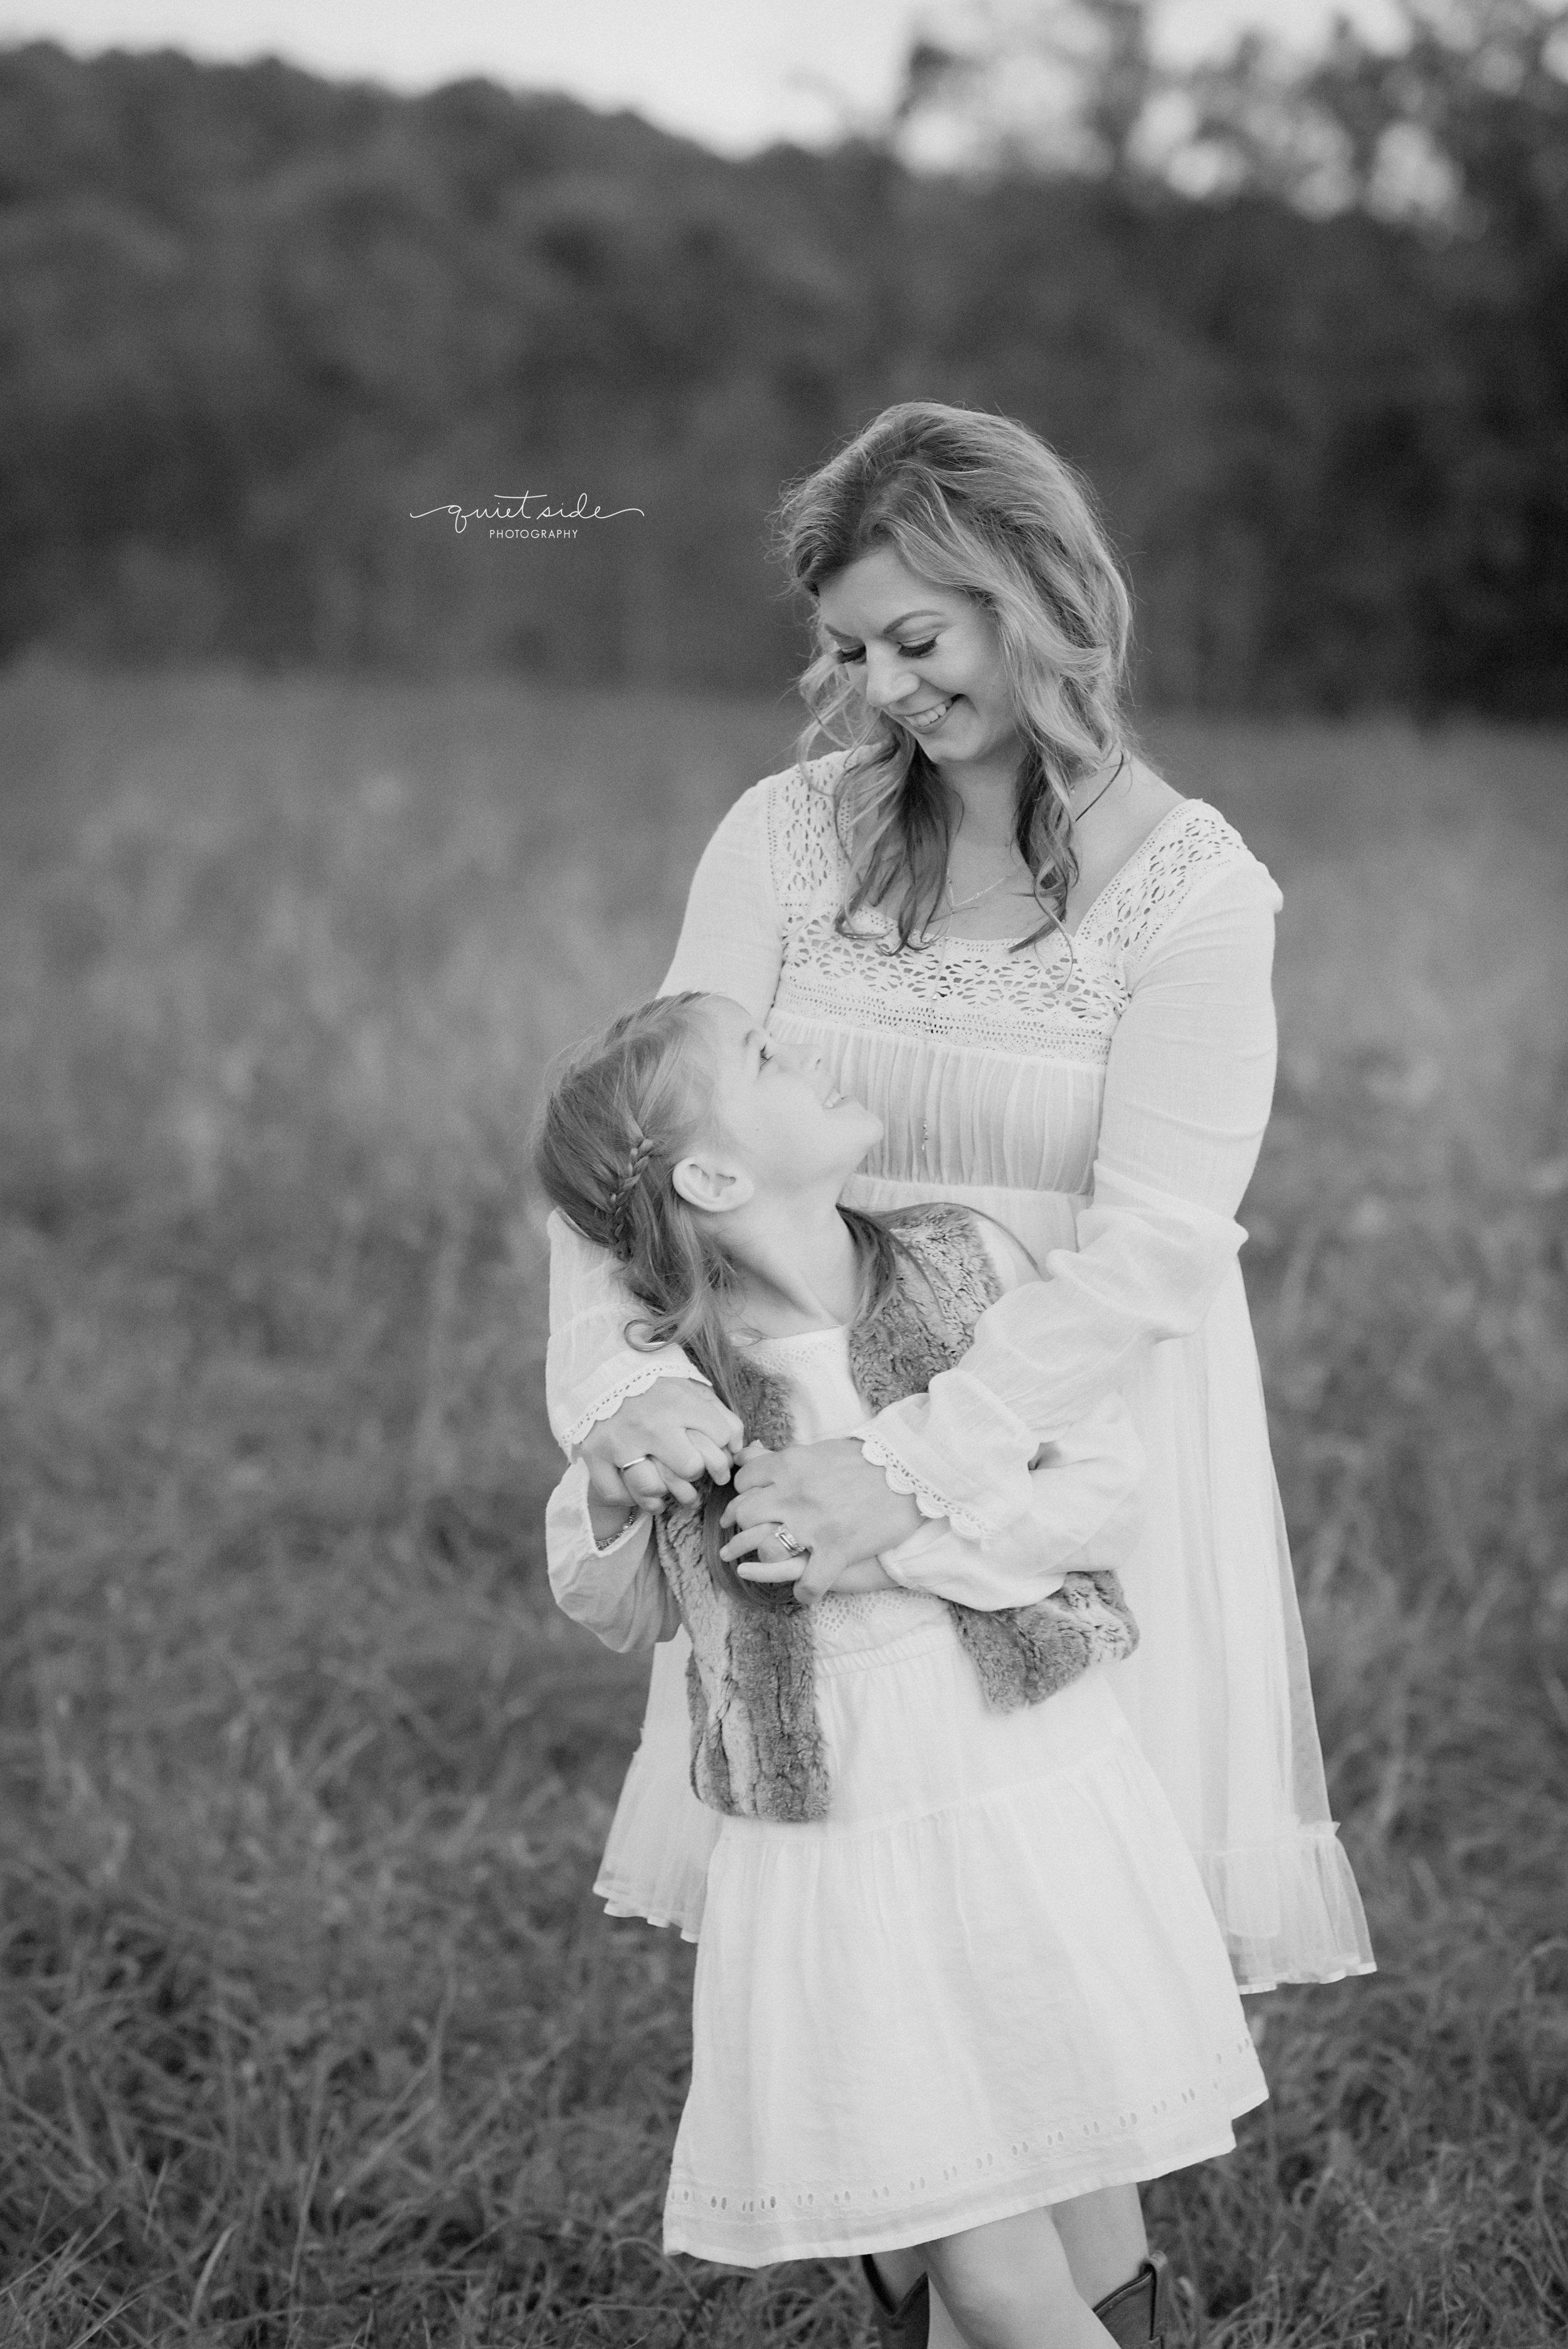 QuietSidePhotography-Purcellville, VA- Family-Photographer-Motherhood-Familyof5-SilverbrookFarm-GoldenHour-Sunset-Family-MomandDaughter-blackandwhite-Loudoun County-Virginia-MIlesFamily.jpg